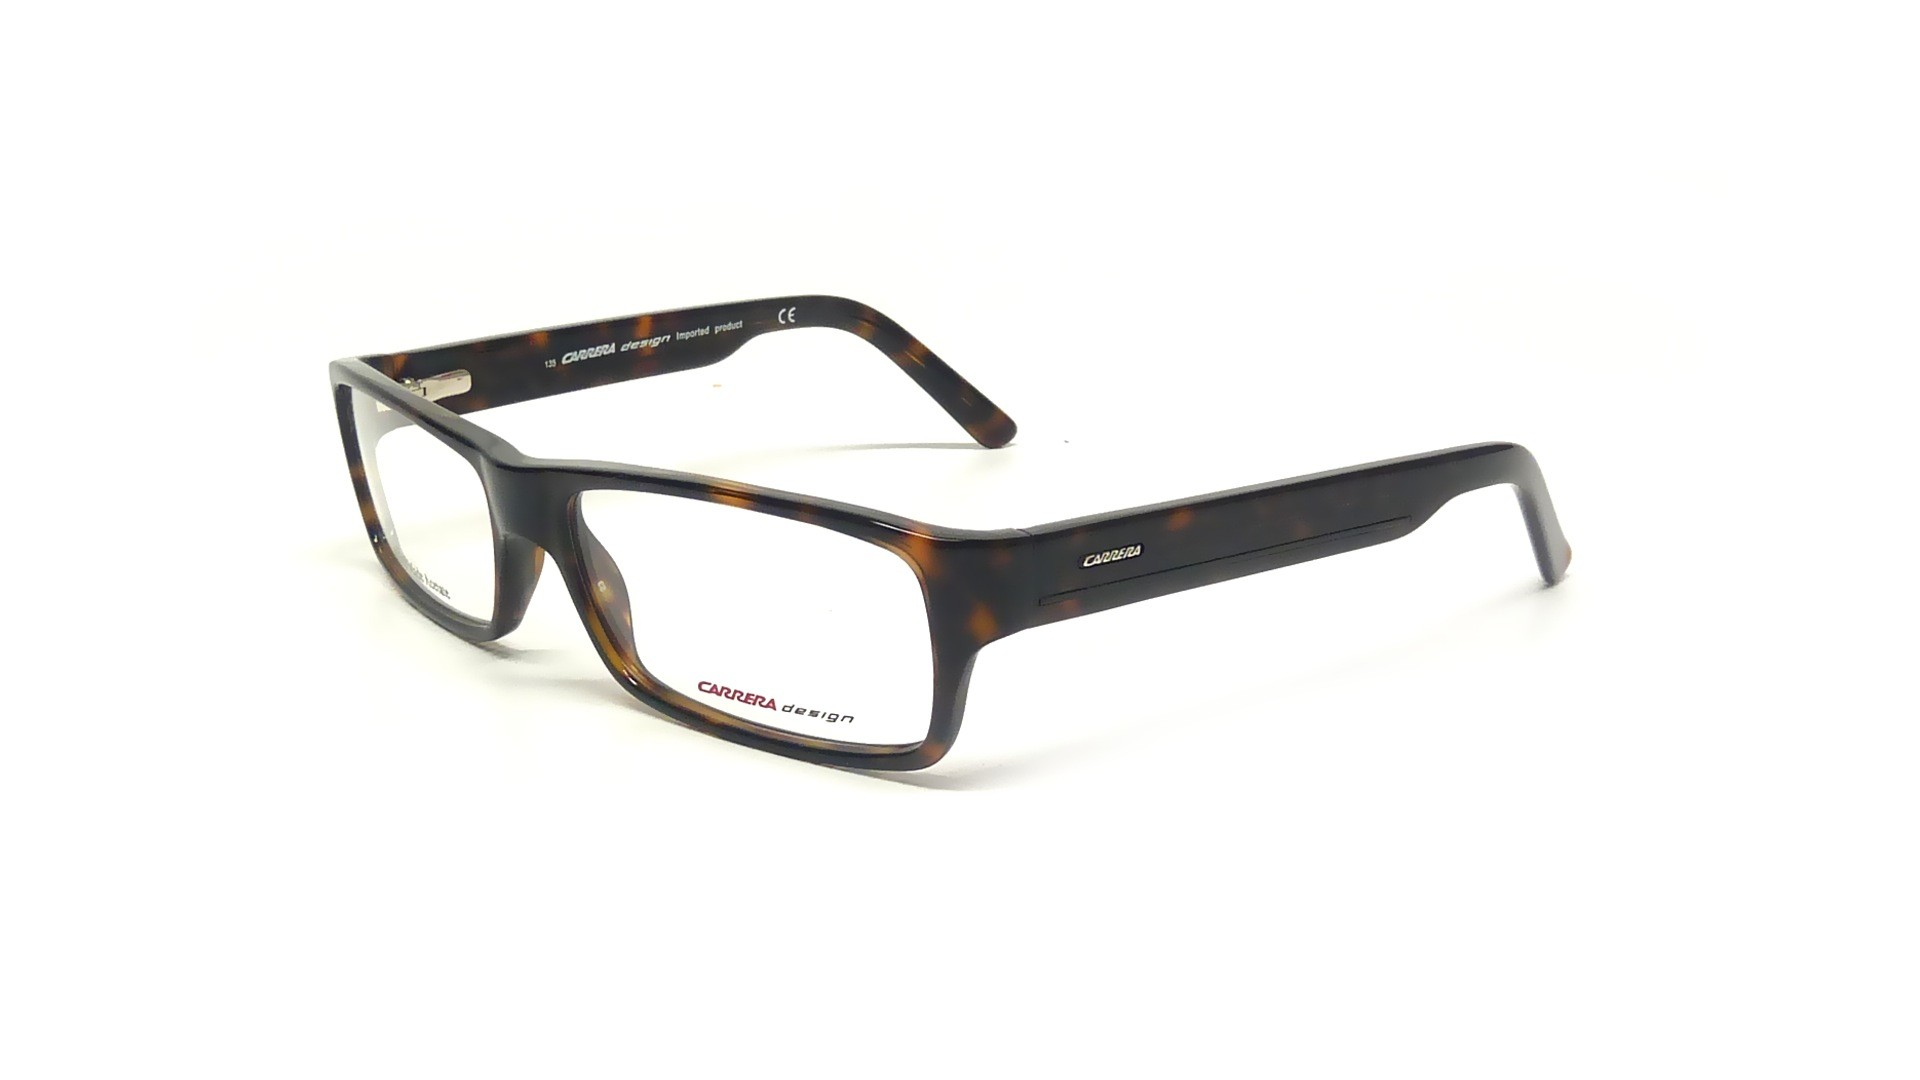 Glasses Frames Recto Or Quiapo : Eye glasses Carrera CA 6132 086 Tortoise